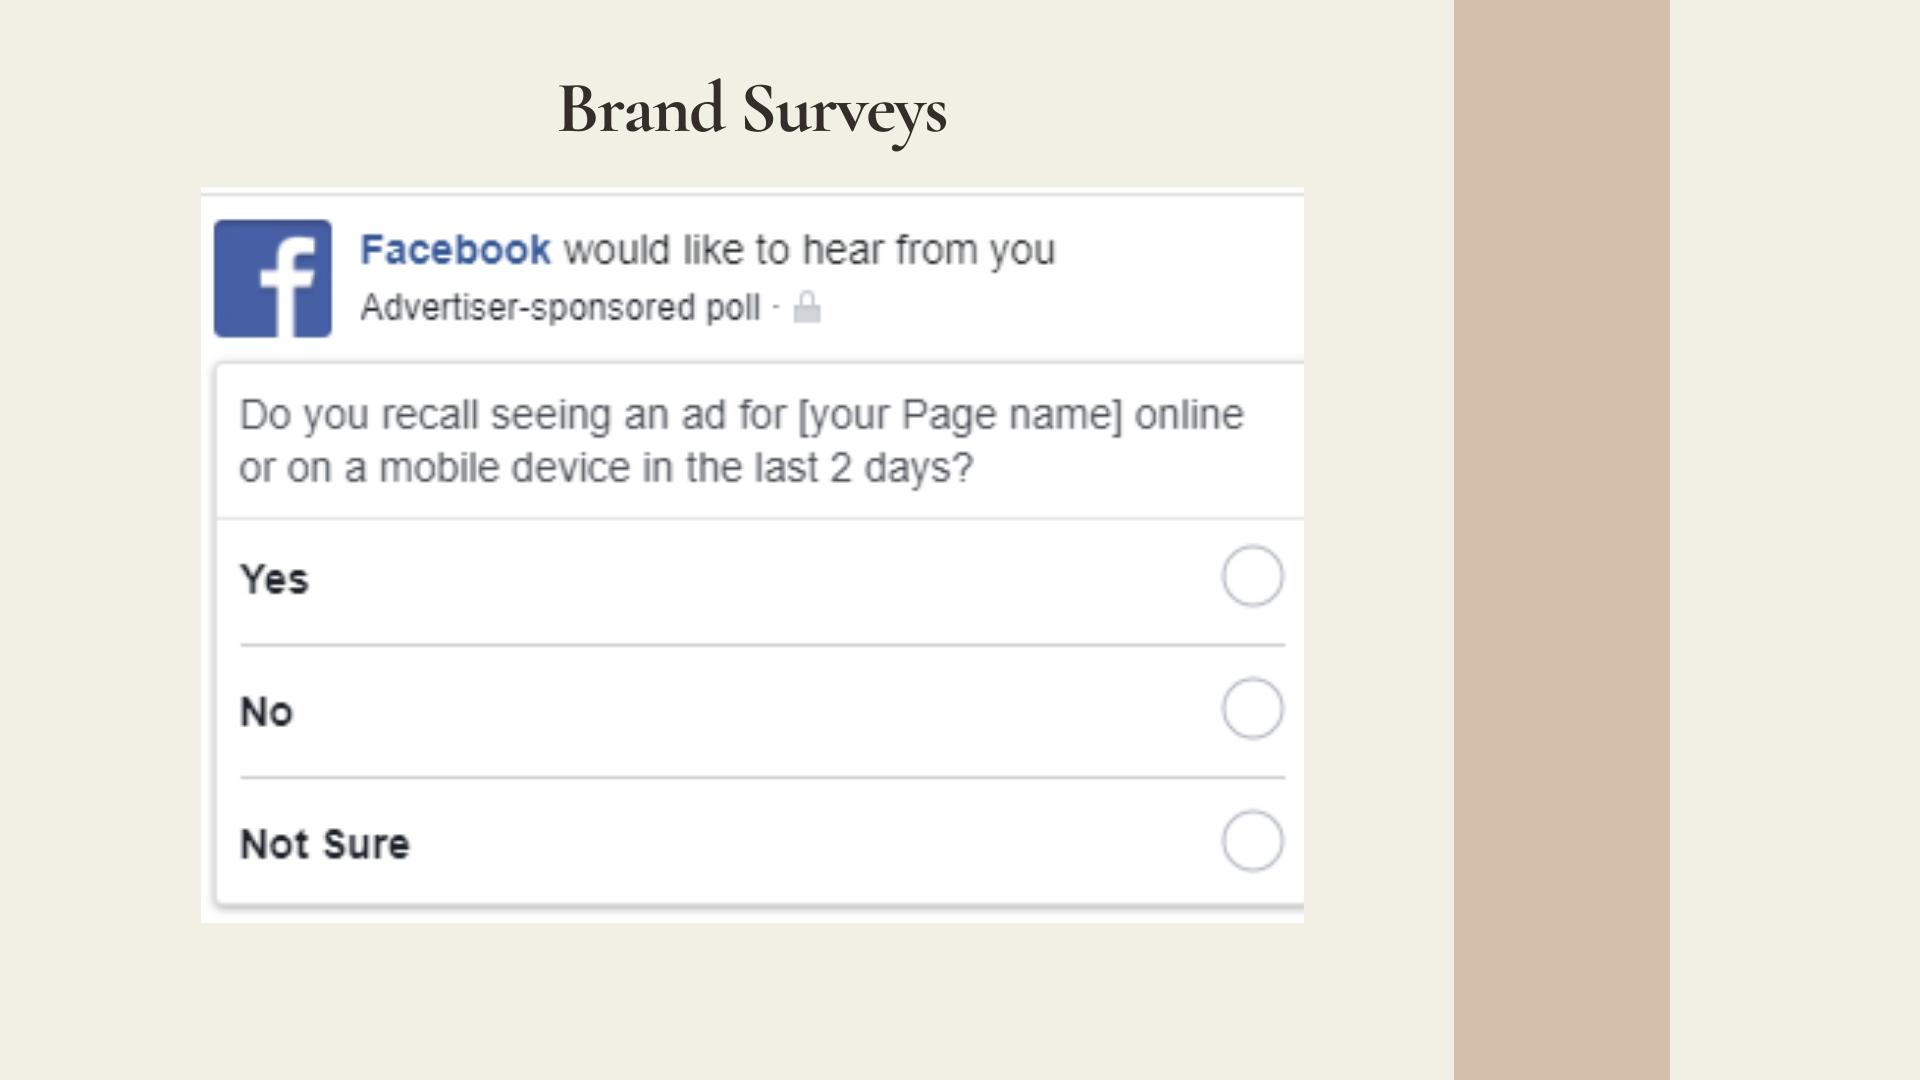 Brand Surveys